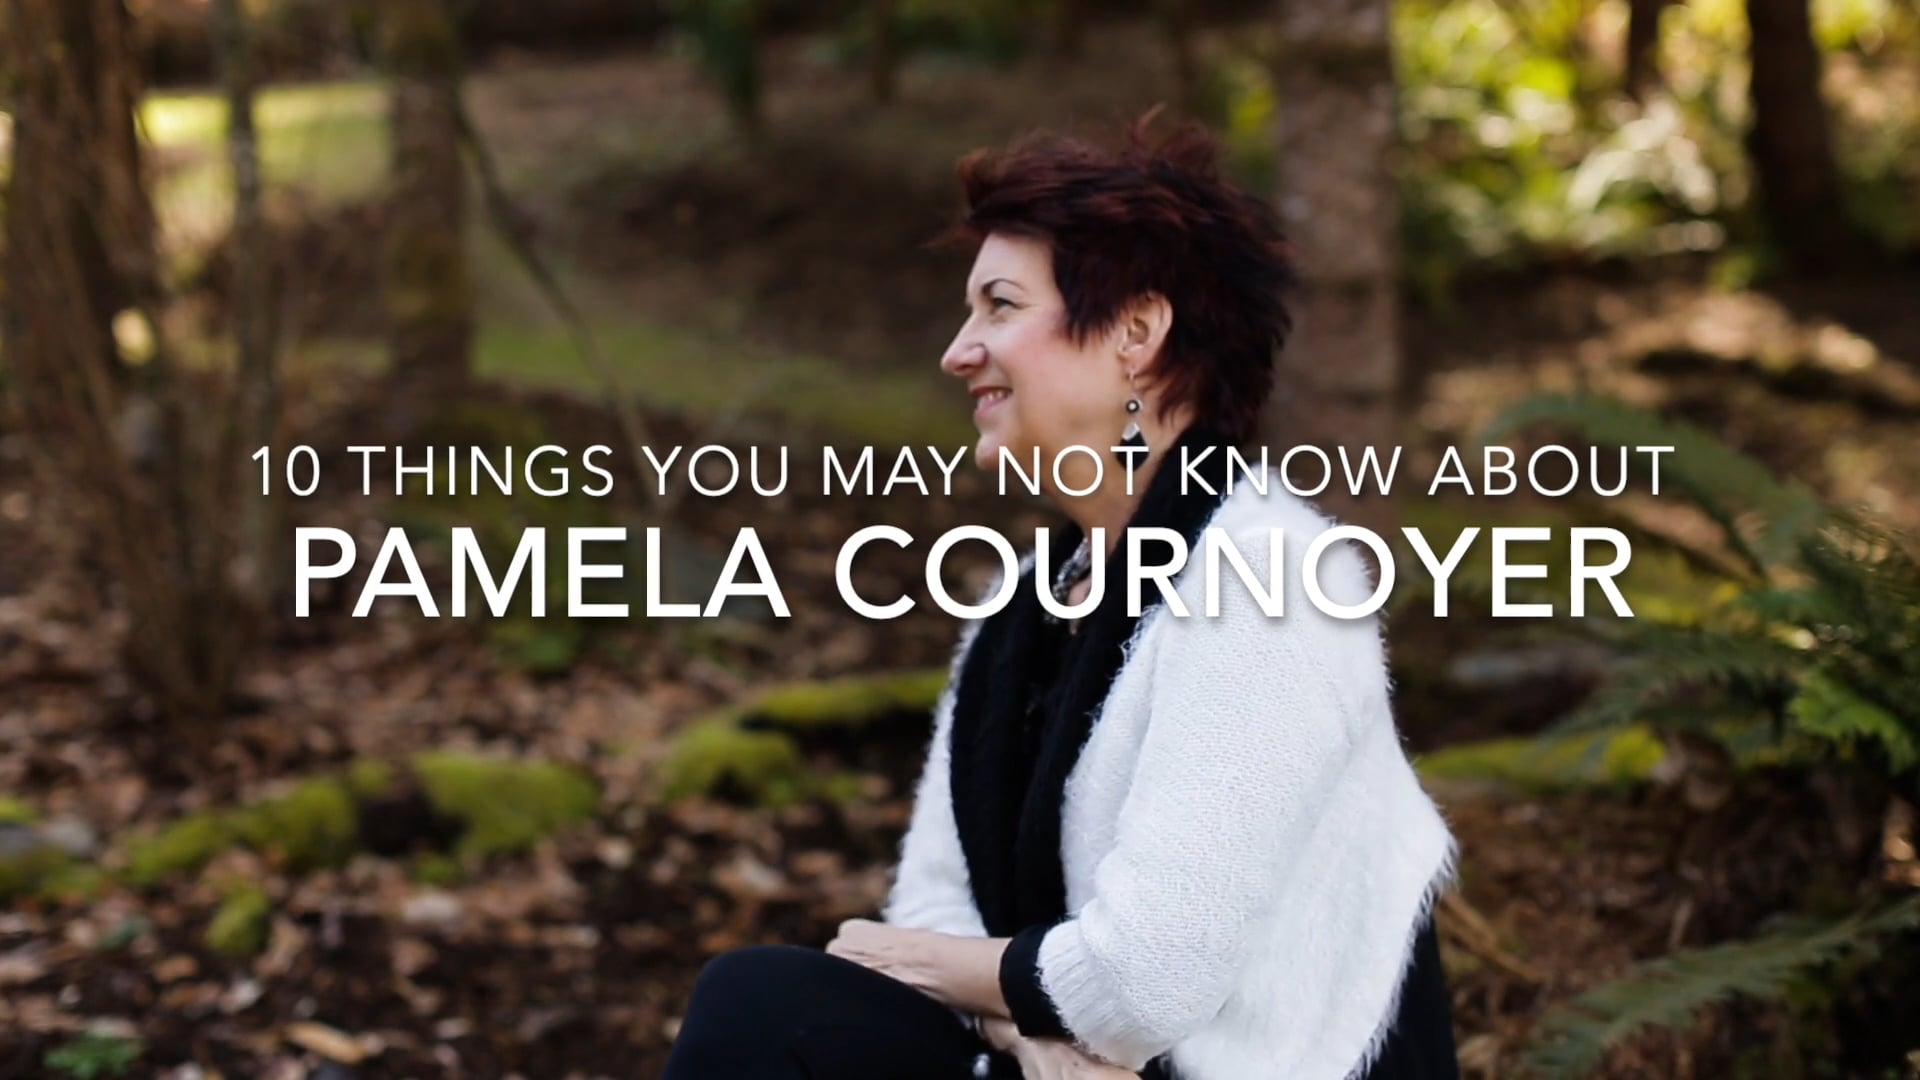 Powerful & True Top 10 Things About Pamela